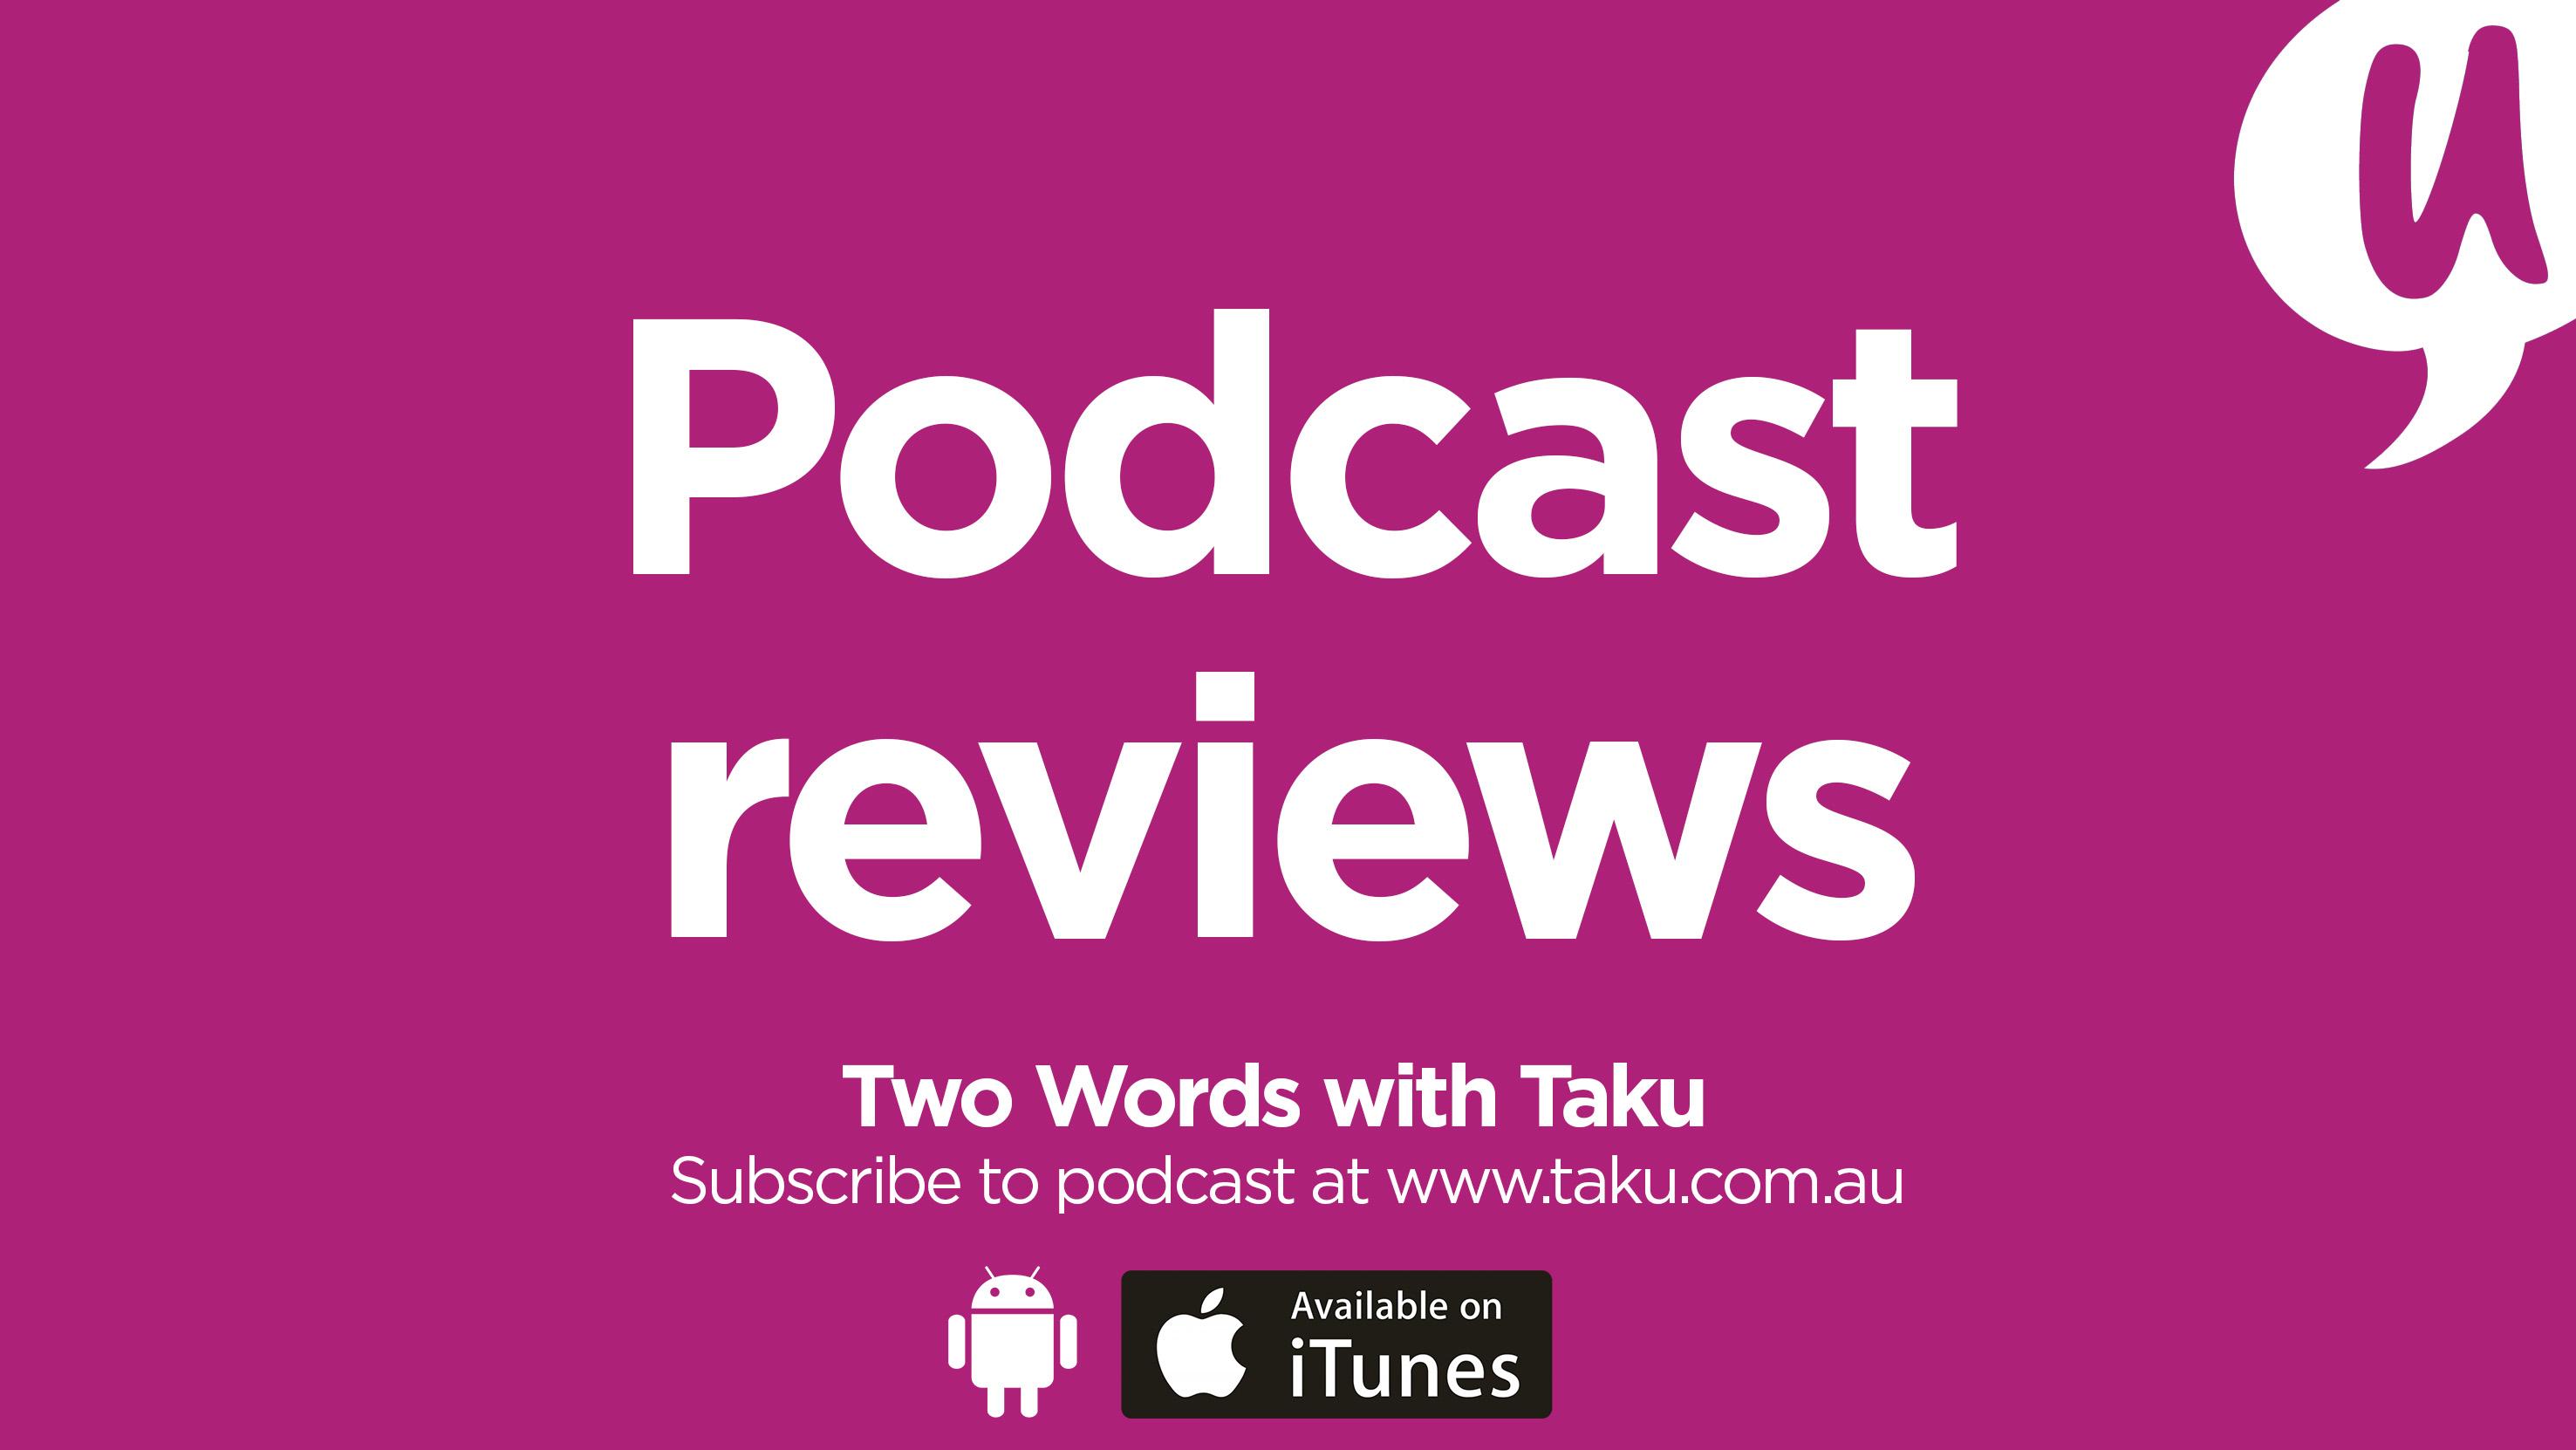 Podcast Reviews S-town, Serial, The Moth Taku Mbudzi